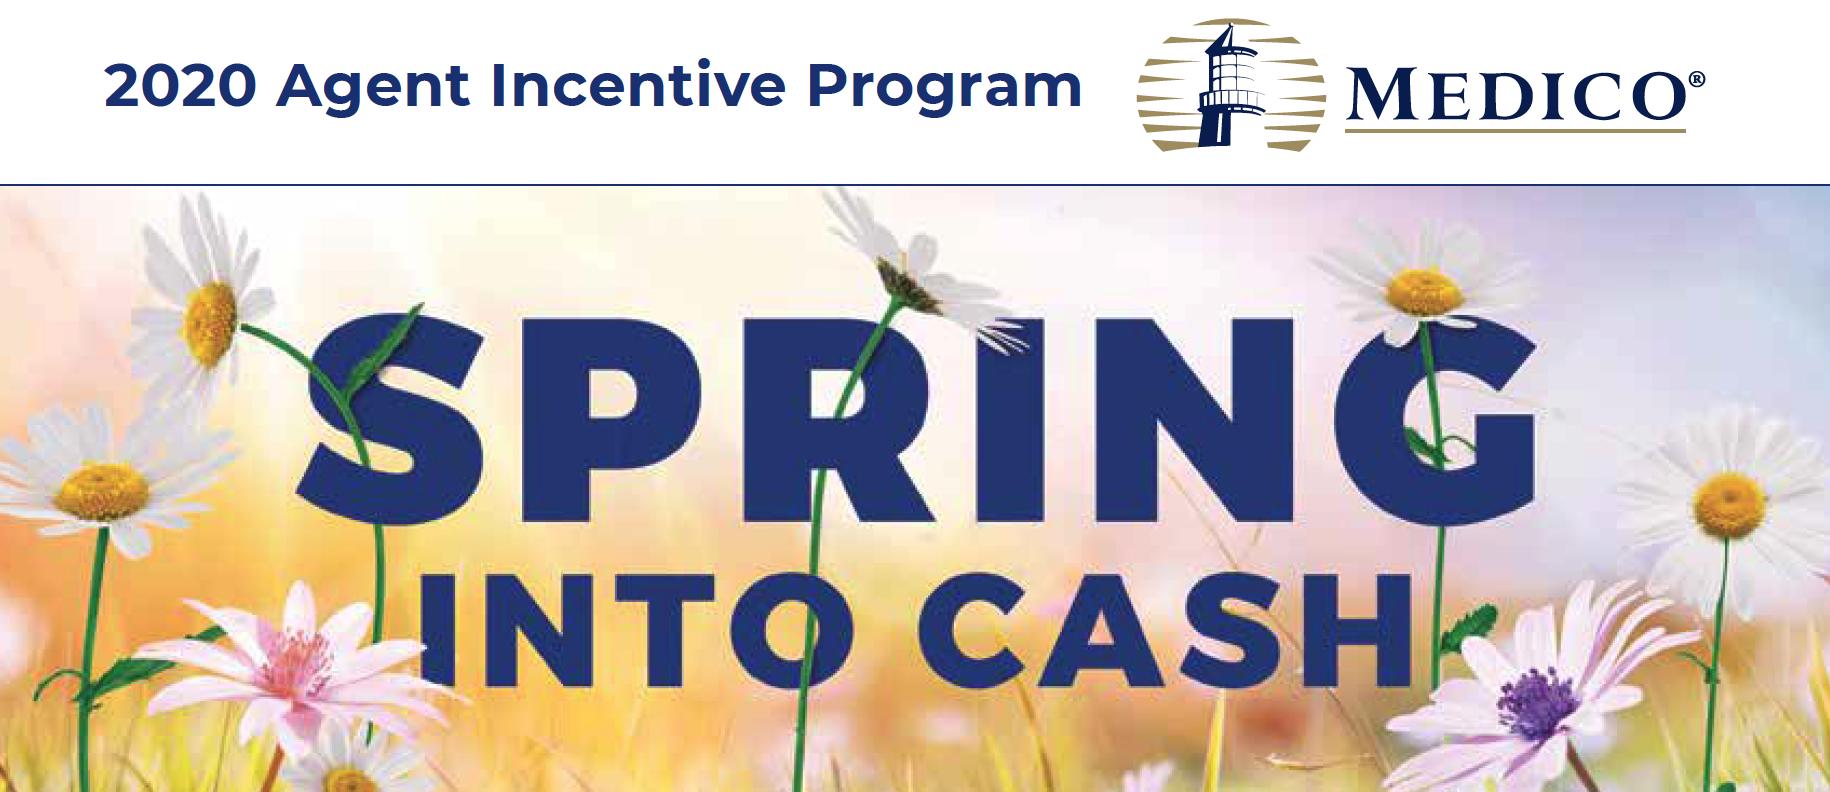 2020 Medico Agent Incentive Program